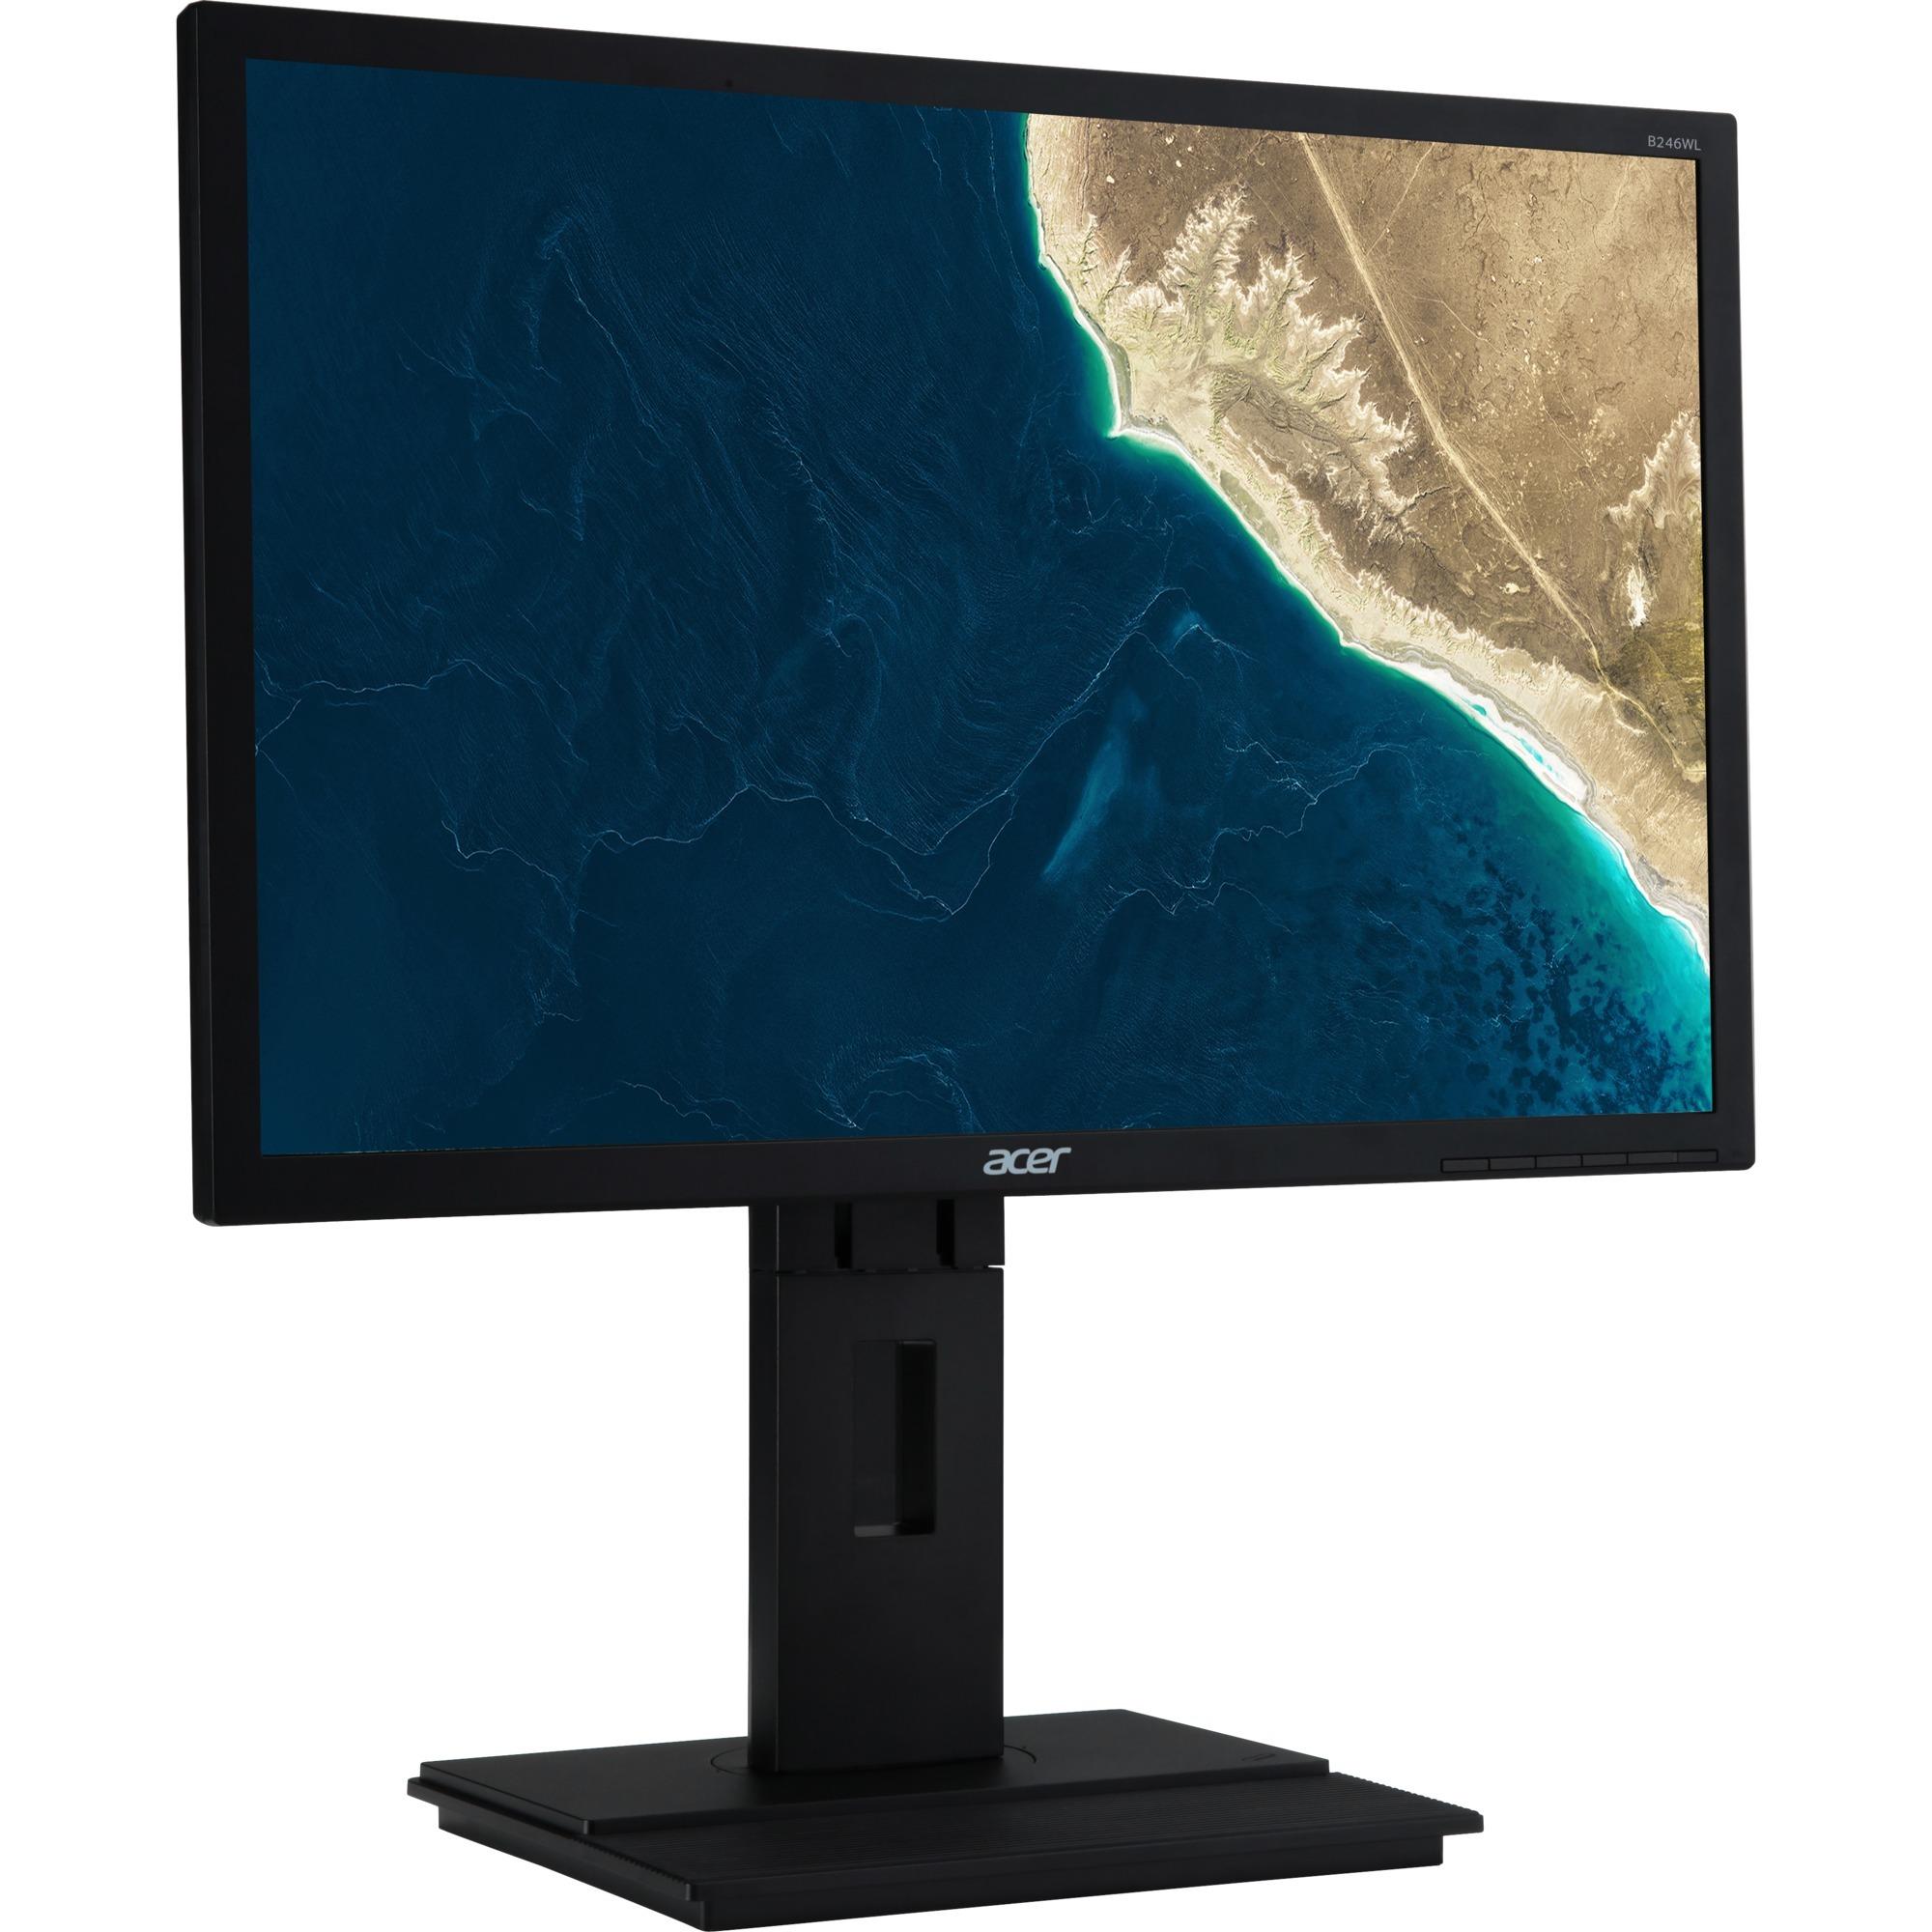 "B6 B246WLA 24"" Full HD IPS Negro Plana pantalla para PC, Monitor LED"